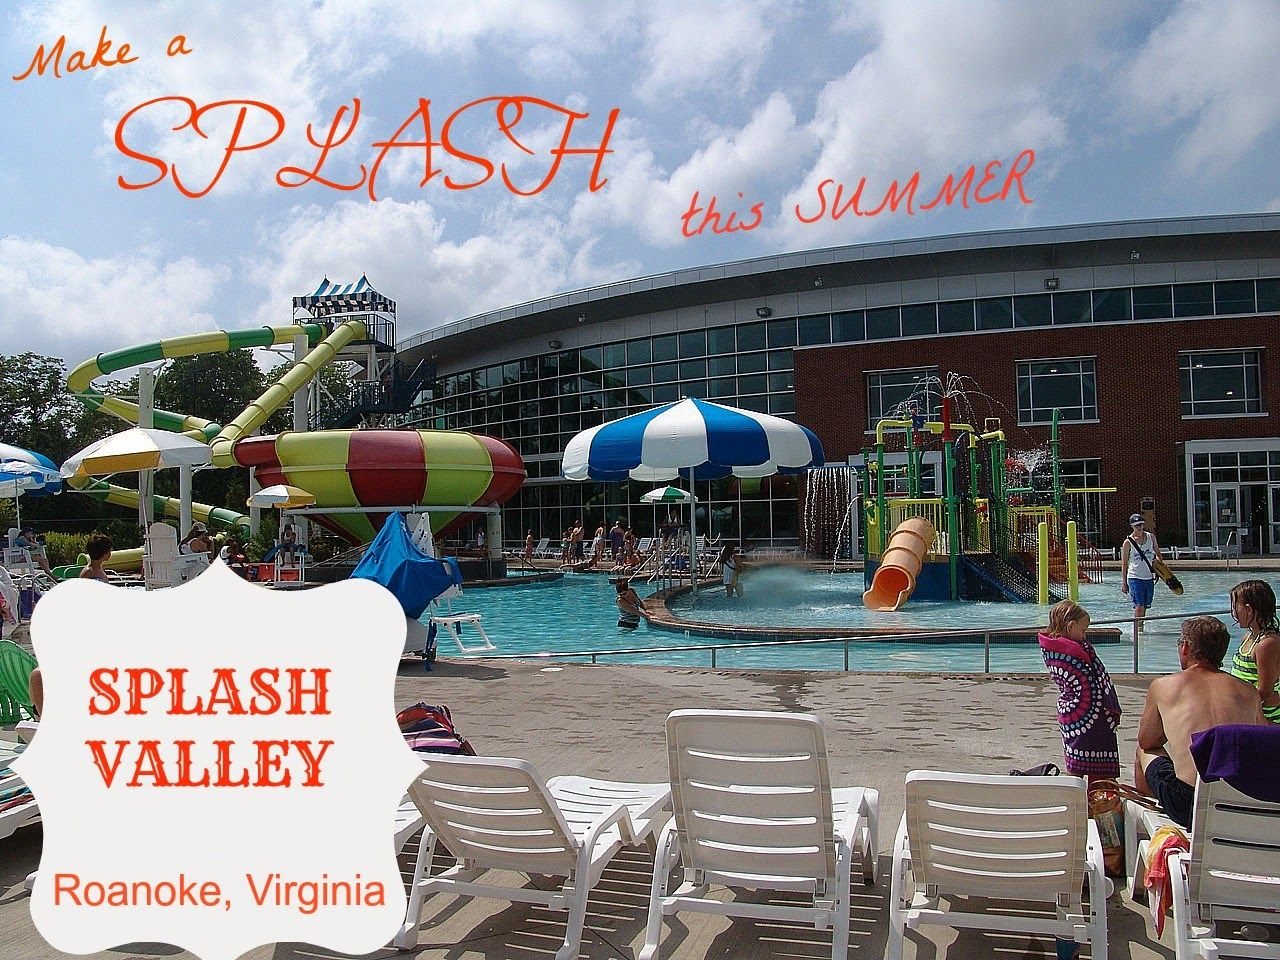 Splash valley review valley splash roanoke